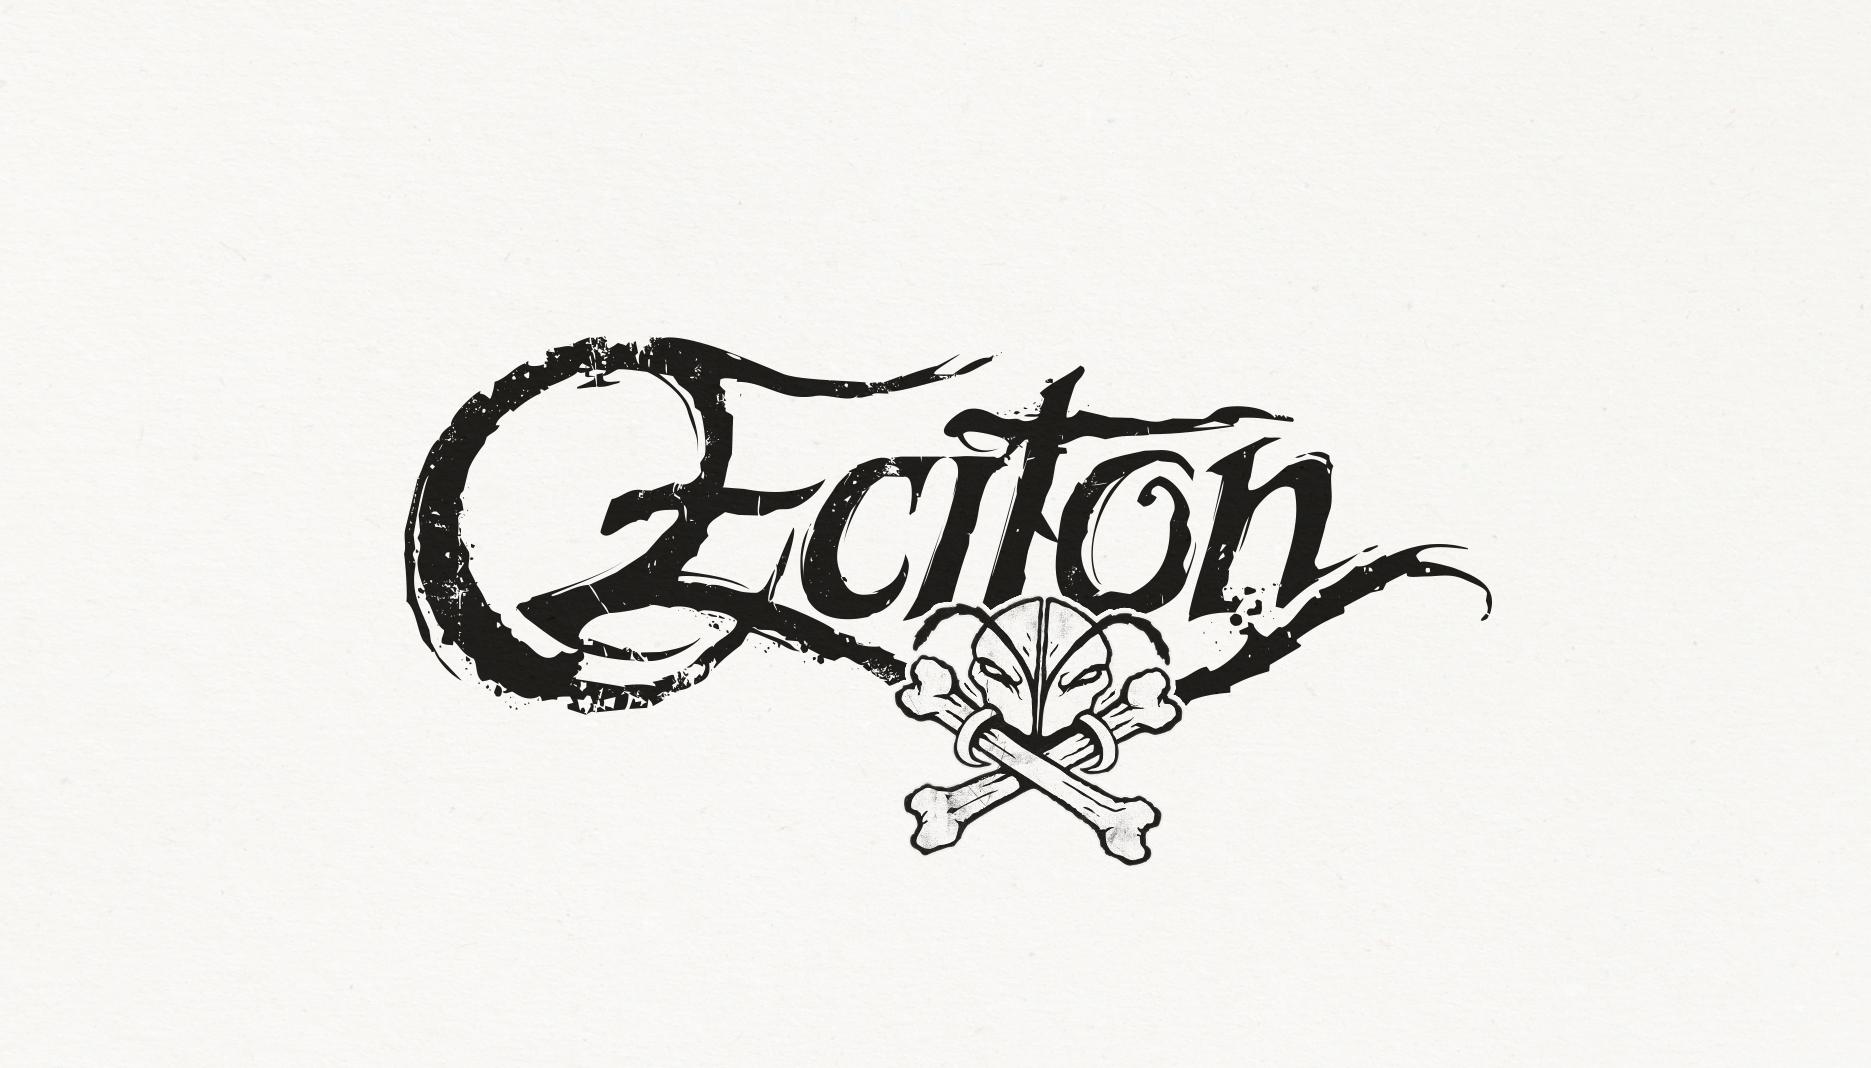 Eciton